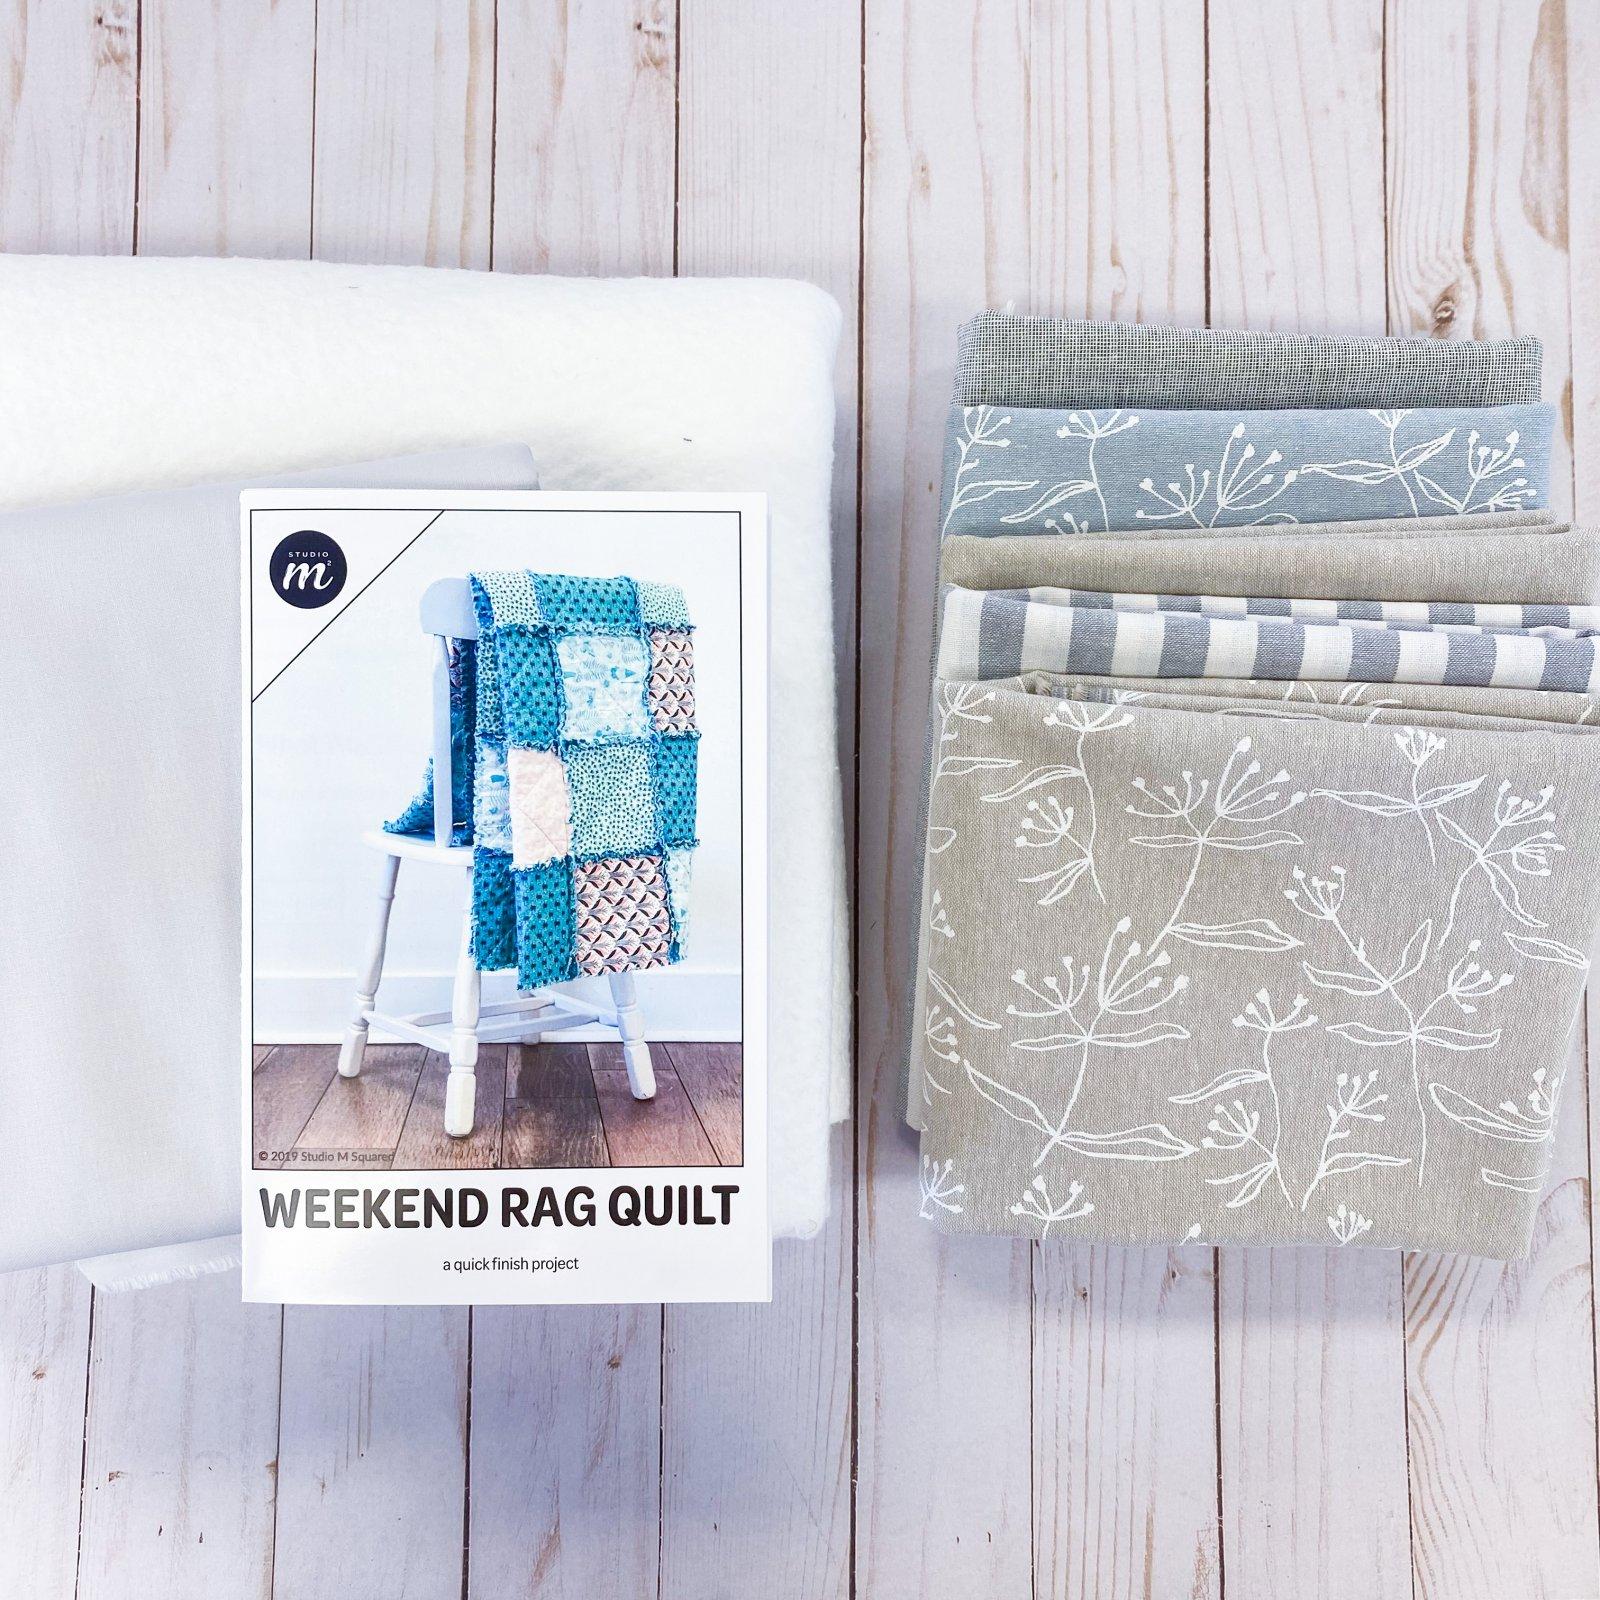 Weekend Rag Quilt - Throw Size - Coastal Breeze